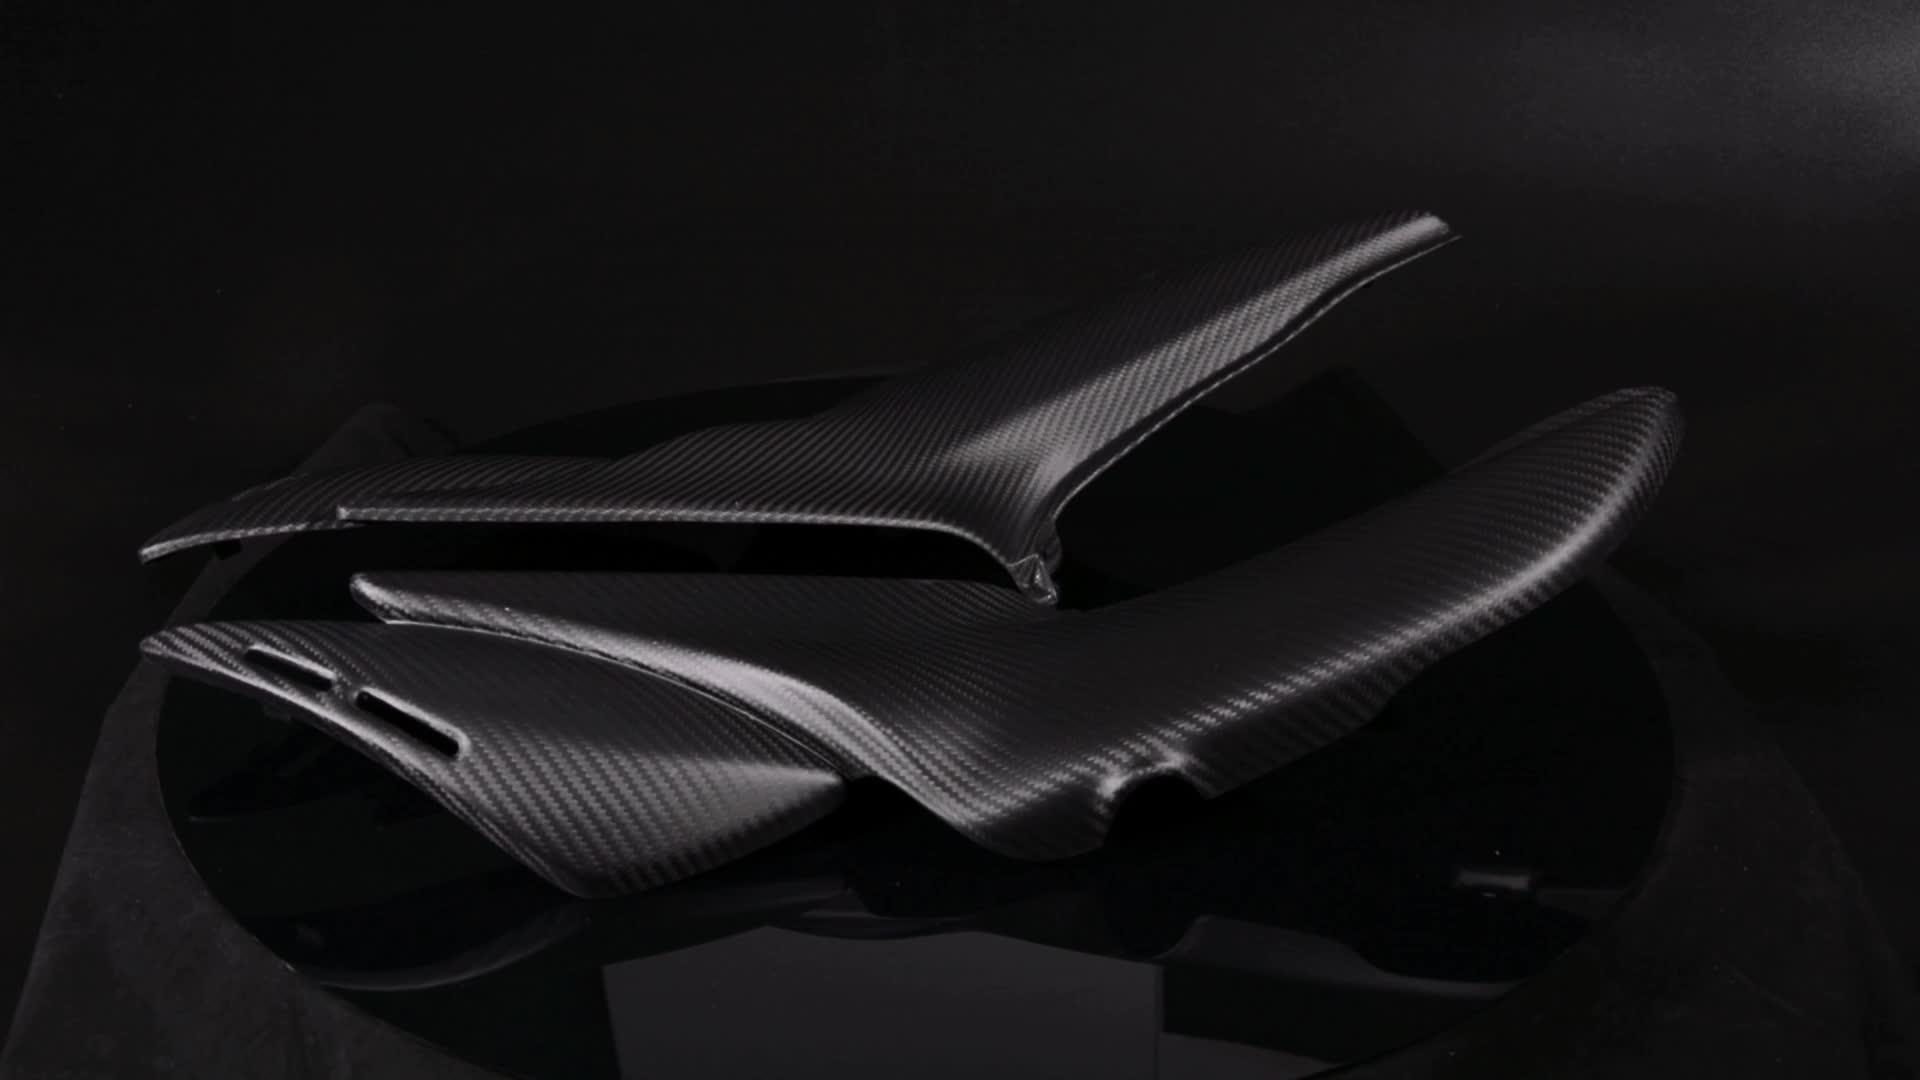 Motosiklet 100% 3K Dimi Örgü Mat Siyah Karbon fiber Parçalar Yan paneller (Yedek) kawasaki Z900 RS 2018